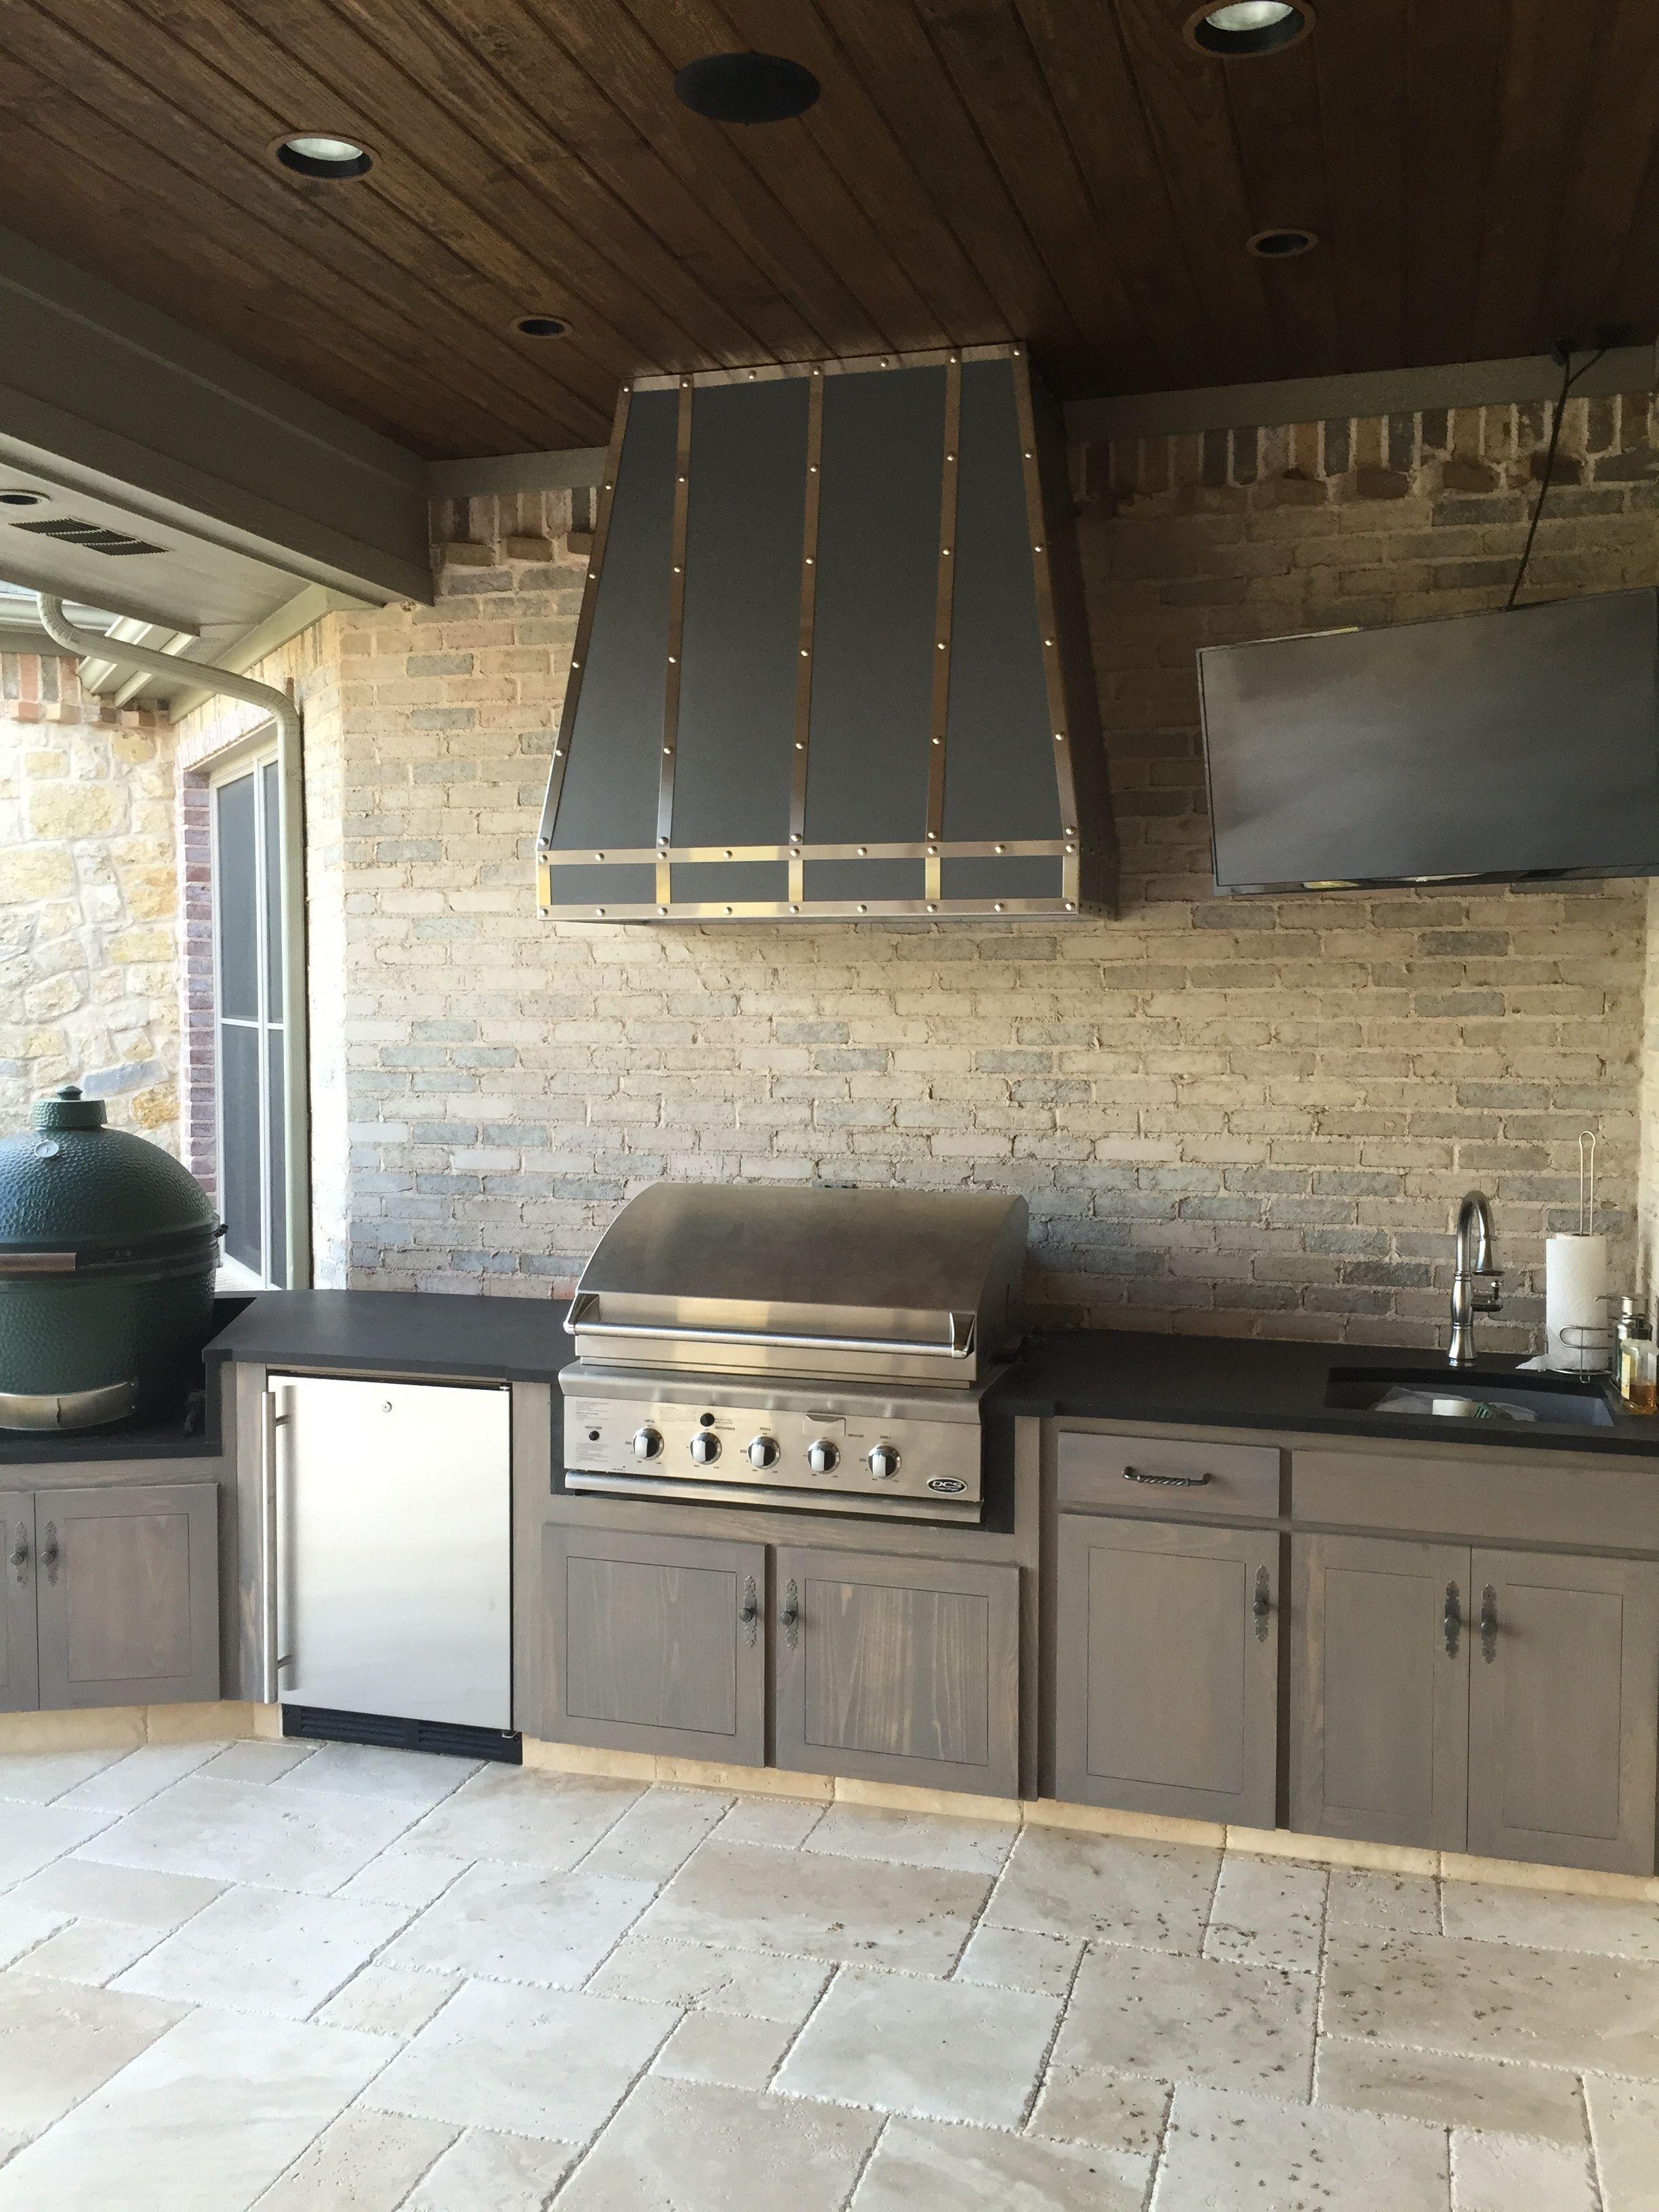 cabinet brass under and stainless custom hoods kitchen made doors range steel design appliances hood zephyr